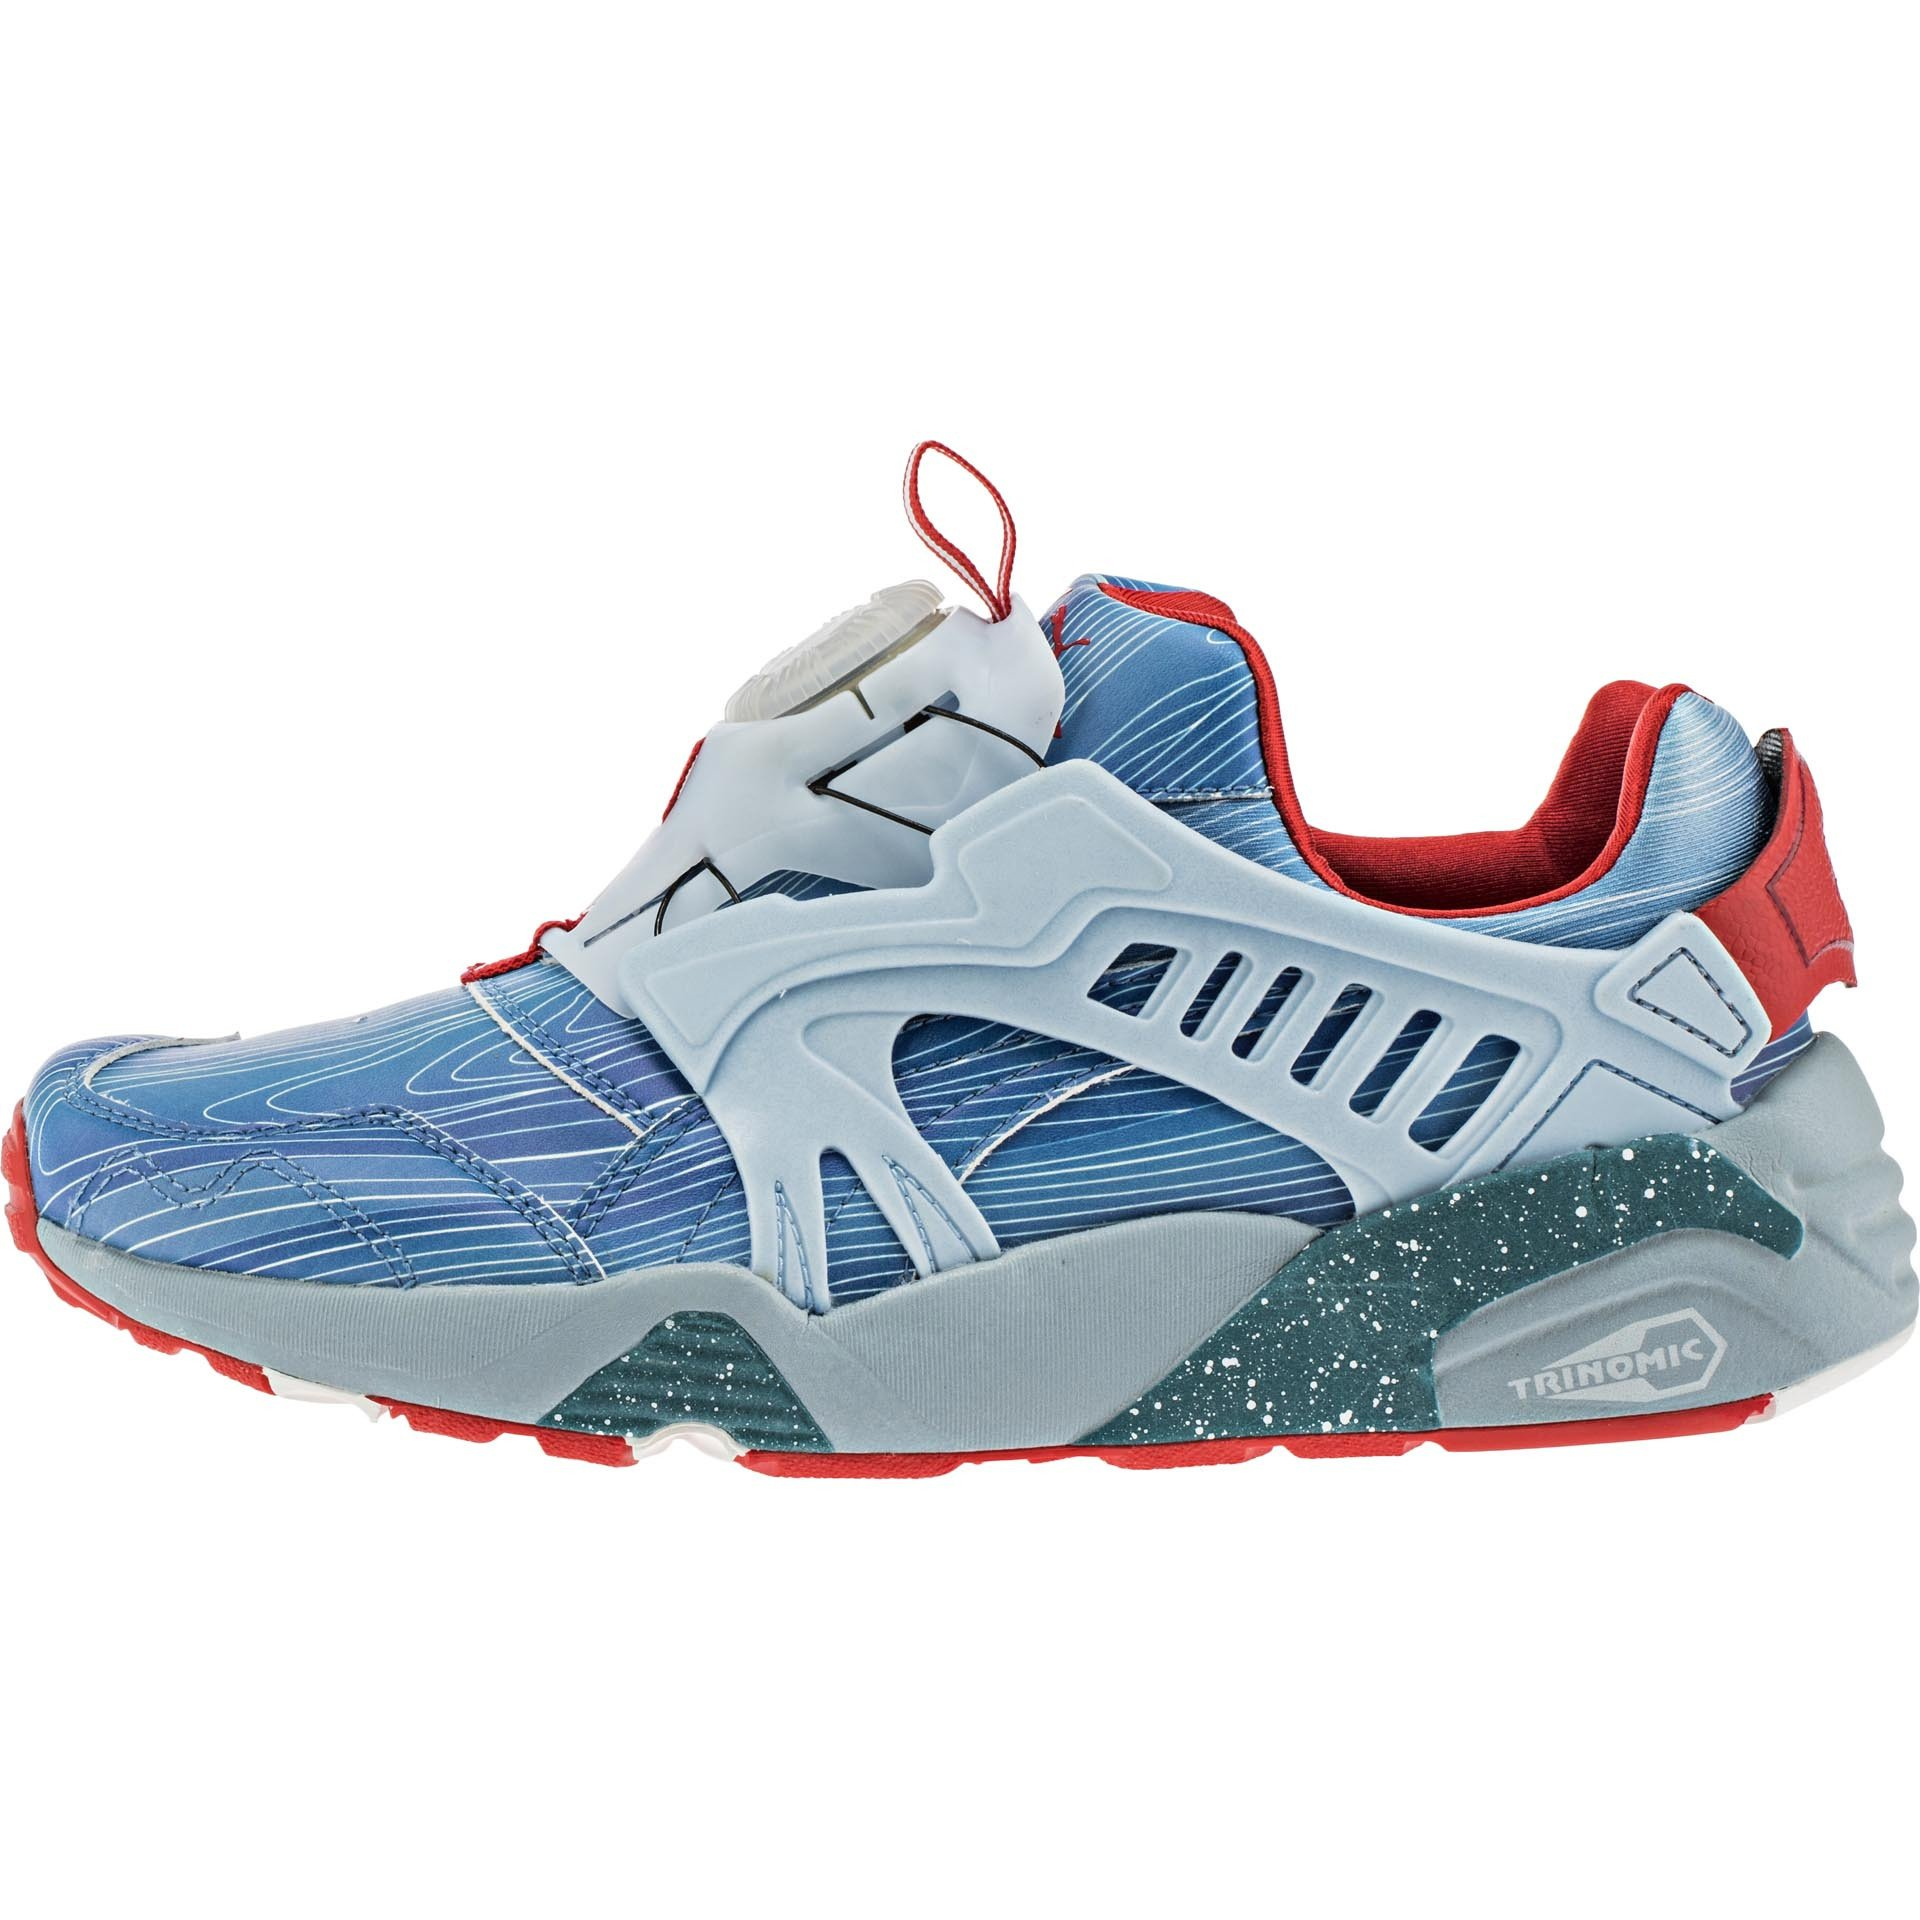 Drawn shoe puma Blaze x ShopNiceKicks Cyan Edt